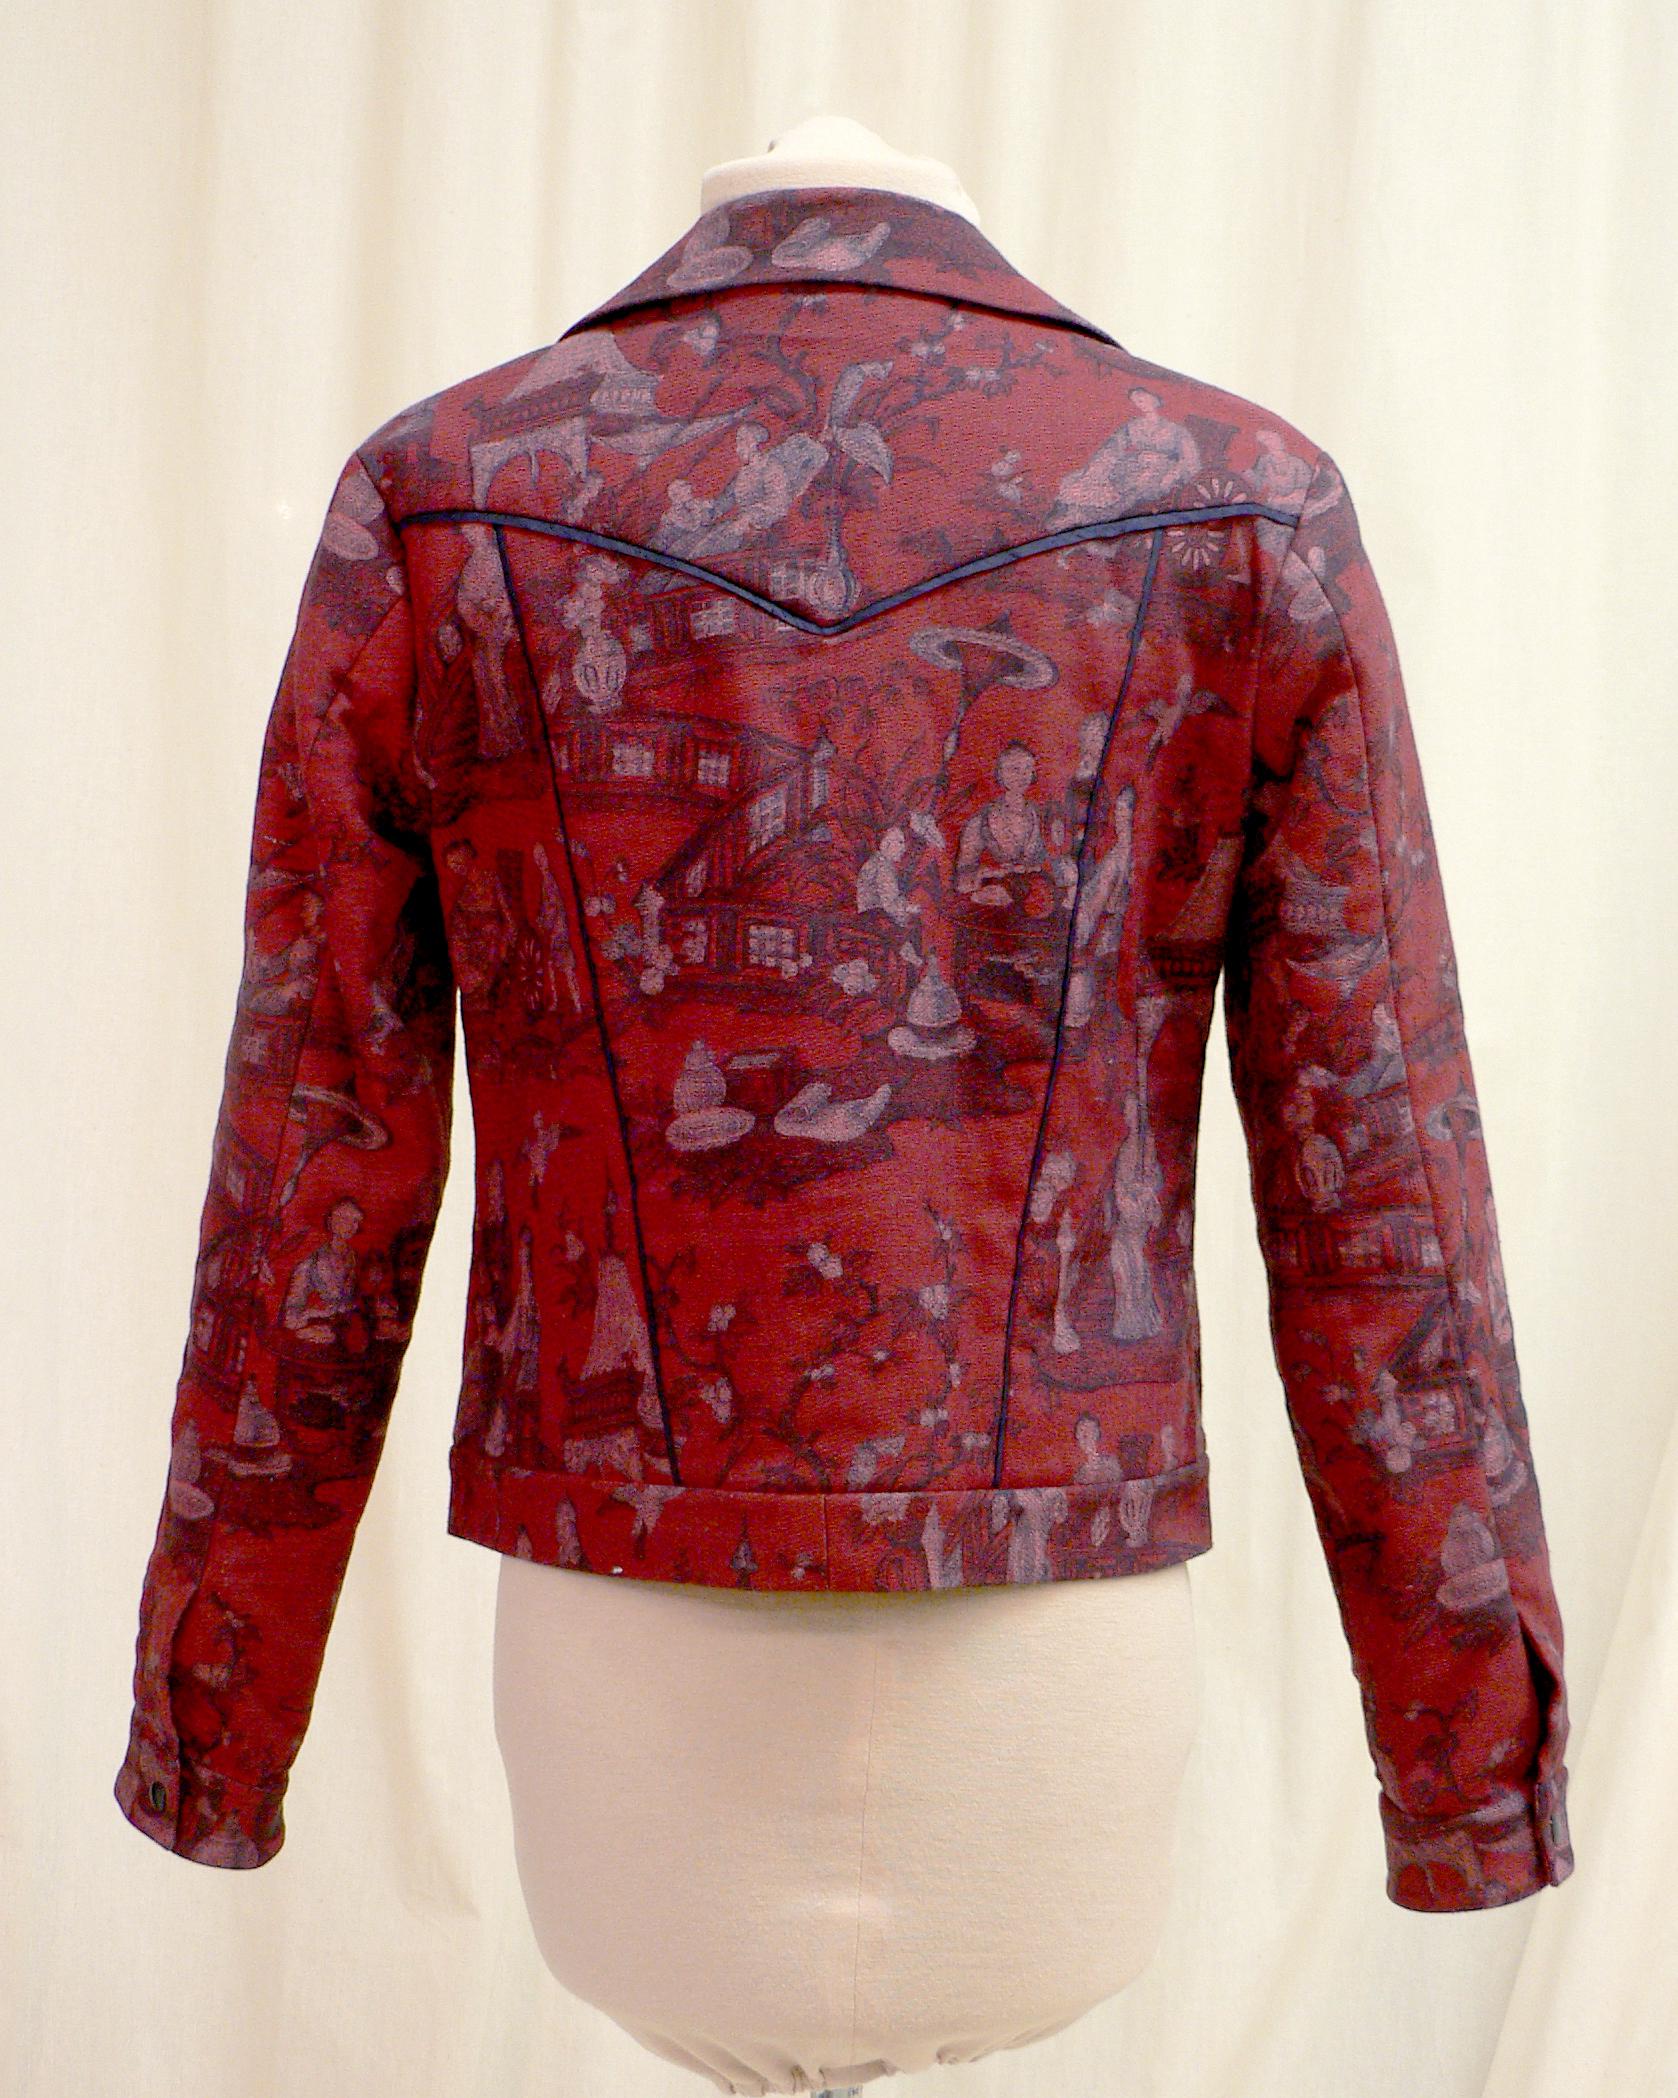 jacket03_back.jpg